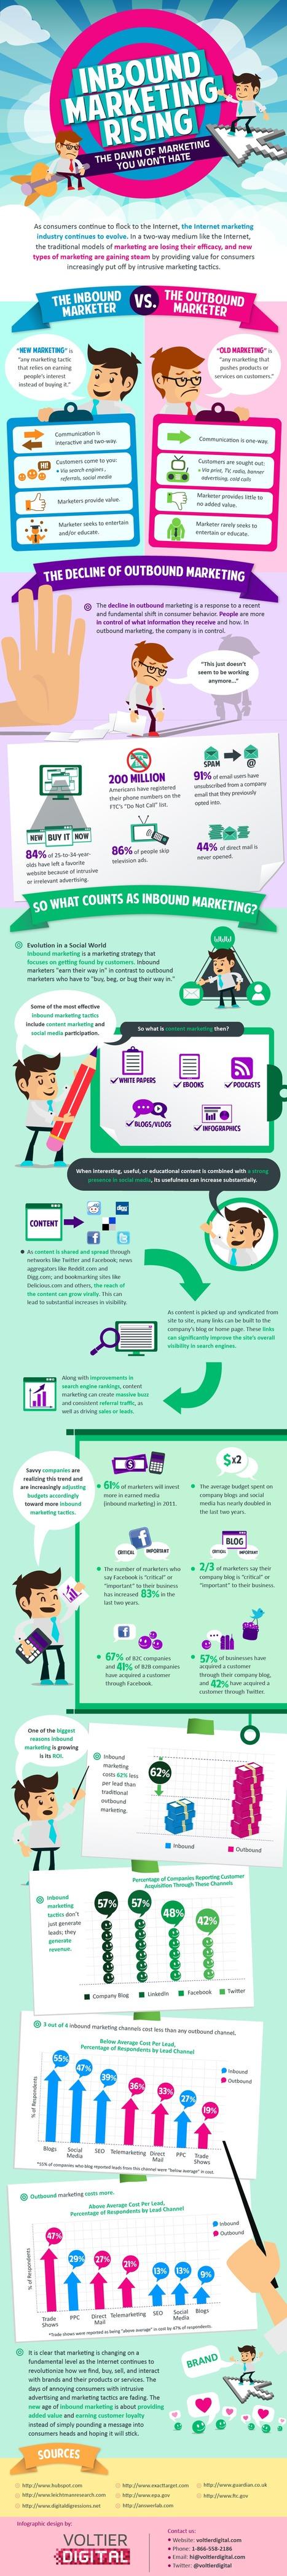 Inbound Marketing vs. Outbound Marketing [Infographic] | Social média -Digital -,CRM | Scoop.it